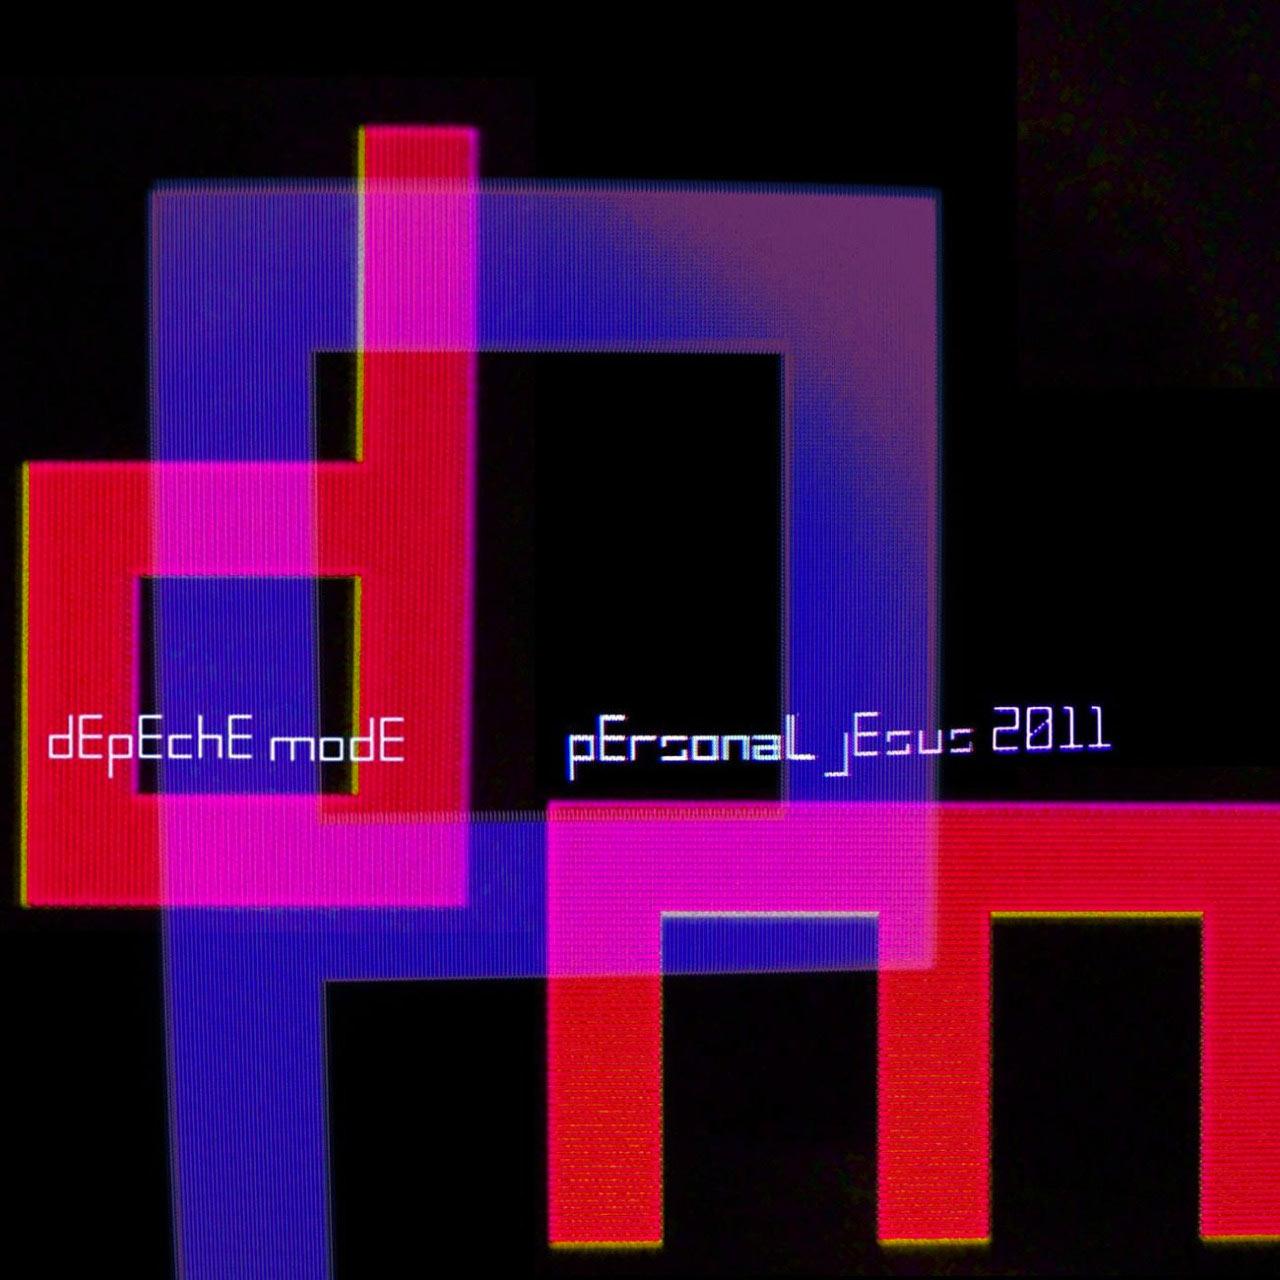 Depeche Mode: Personal Jesus 2011